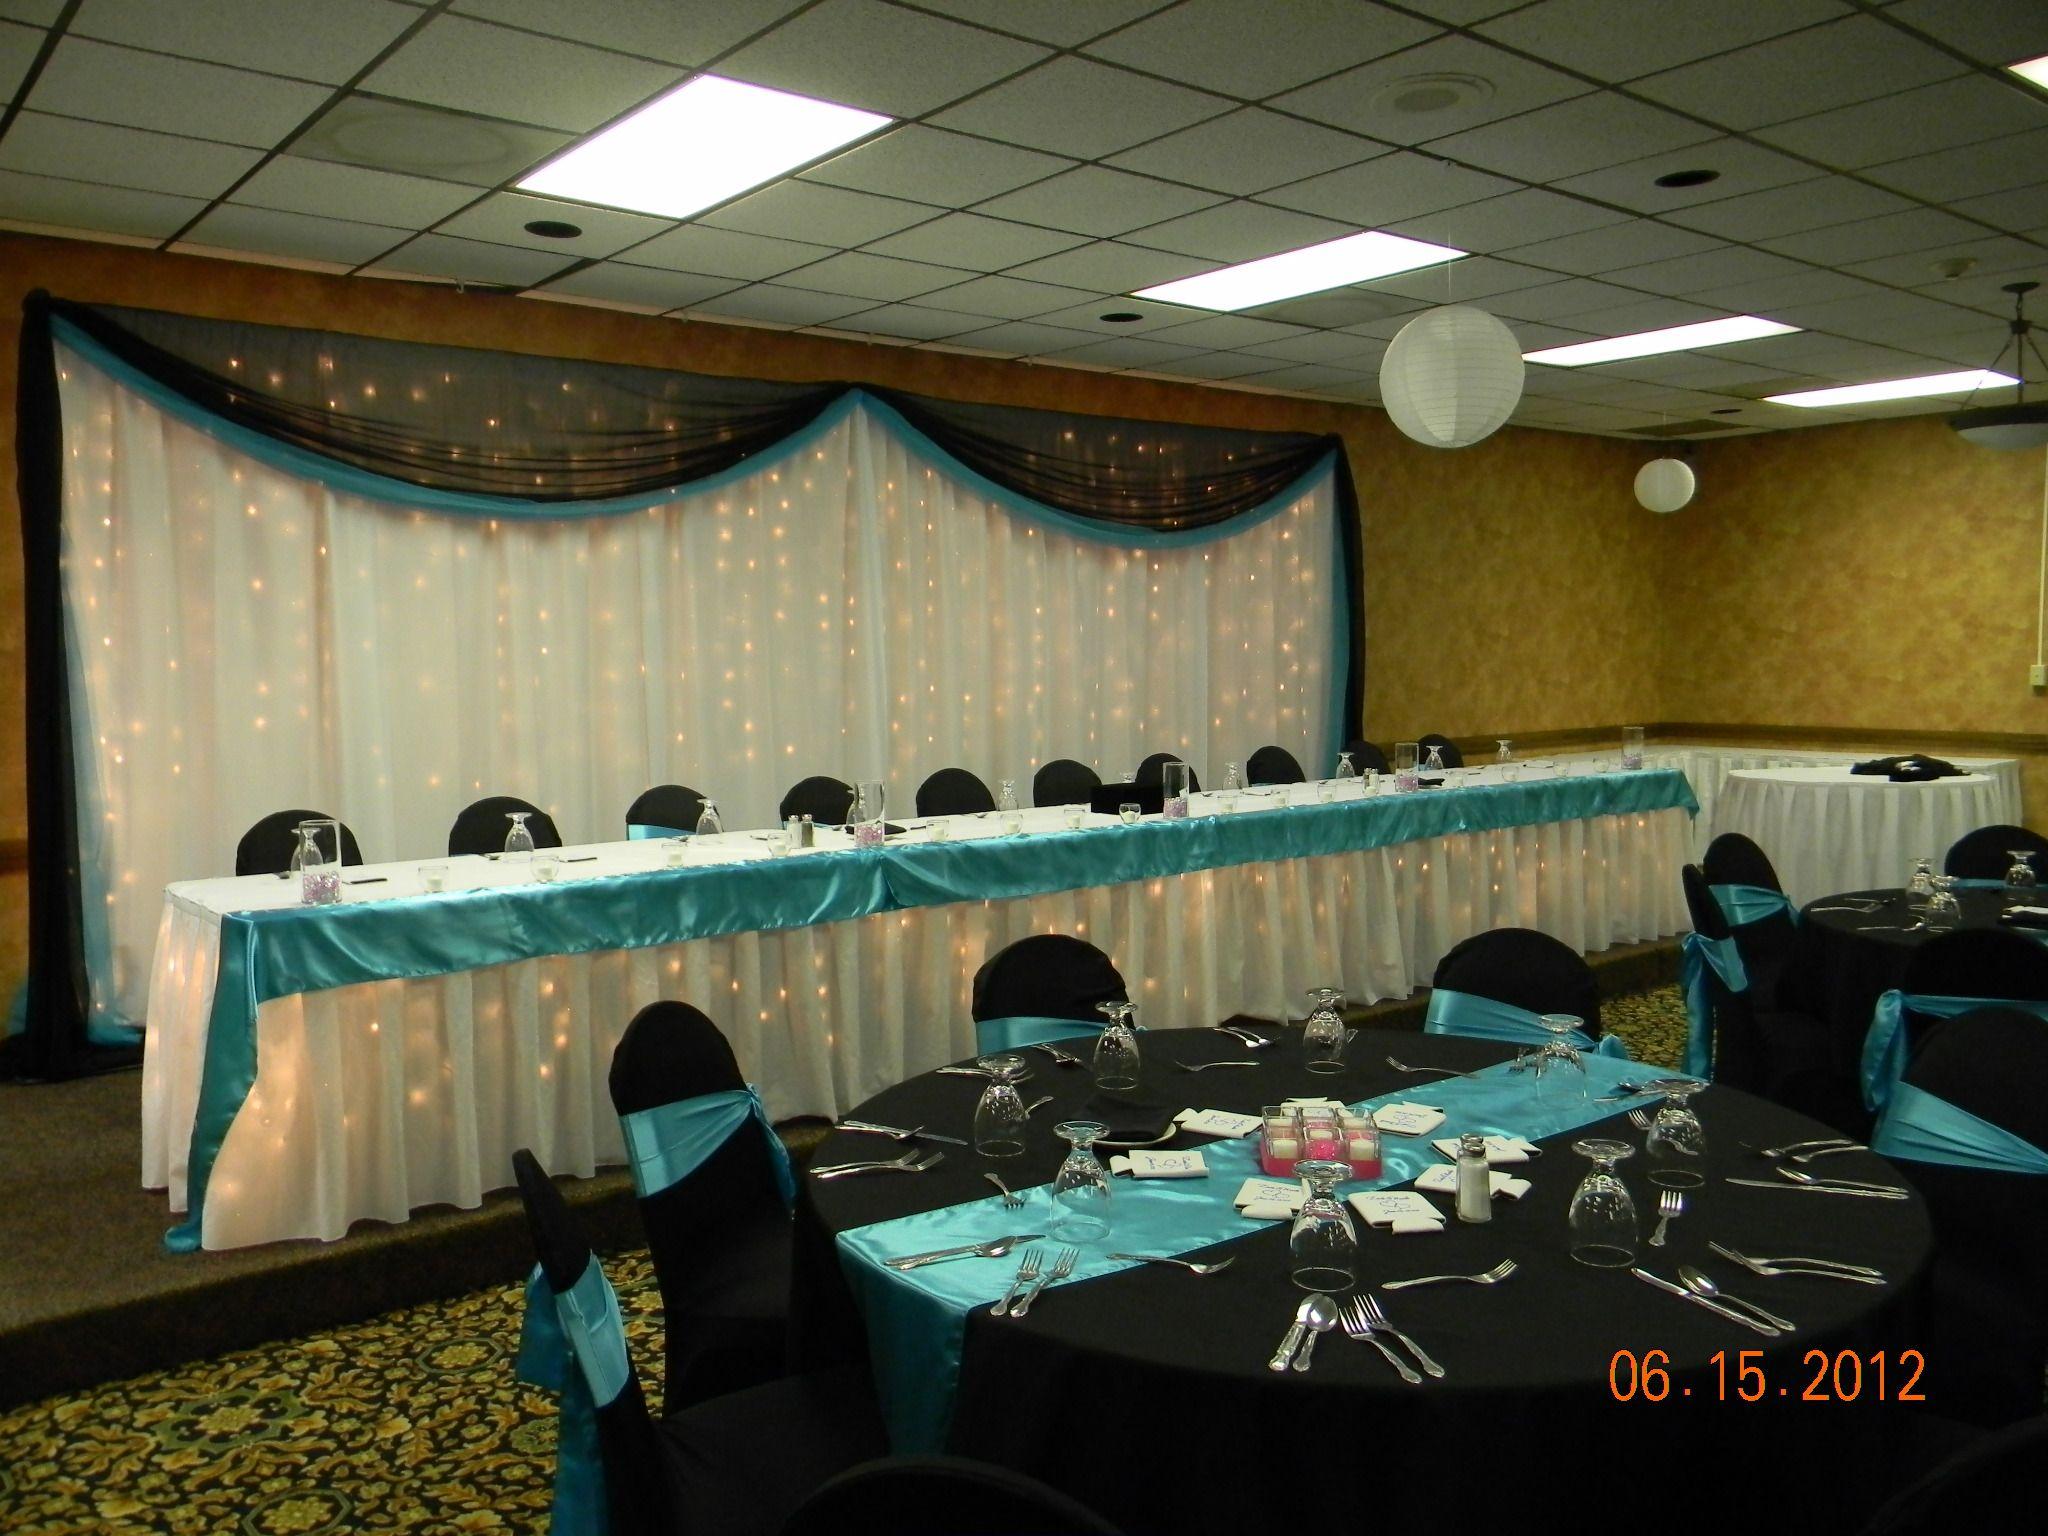 20 White drapery lights backdrop w black chiffon & turquoise